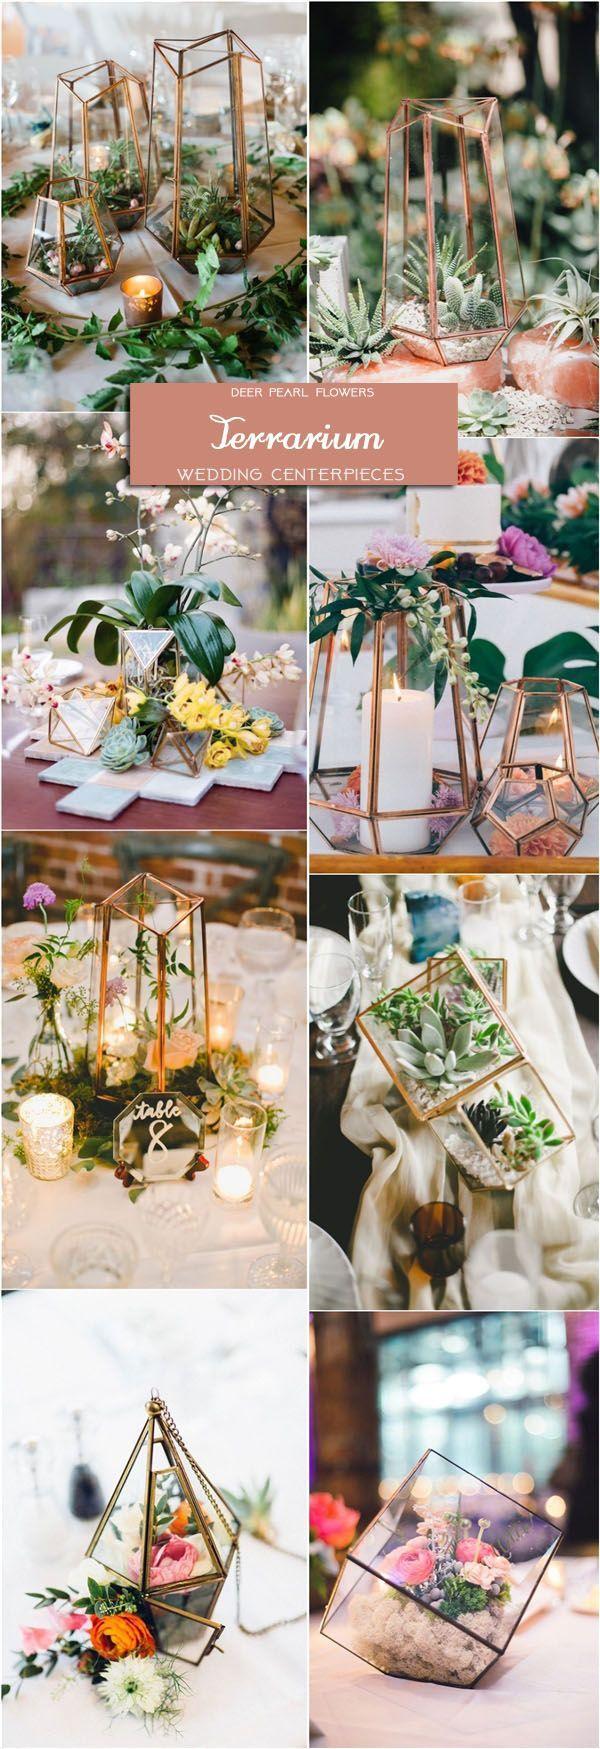 Insanely Wedding Centerpiece Ideas You'll Love